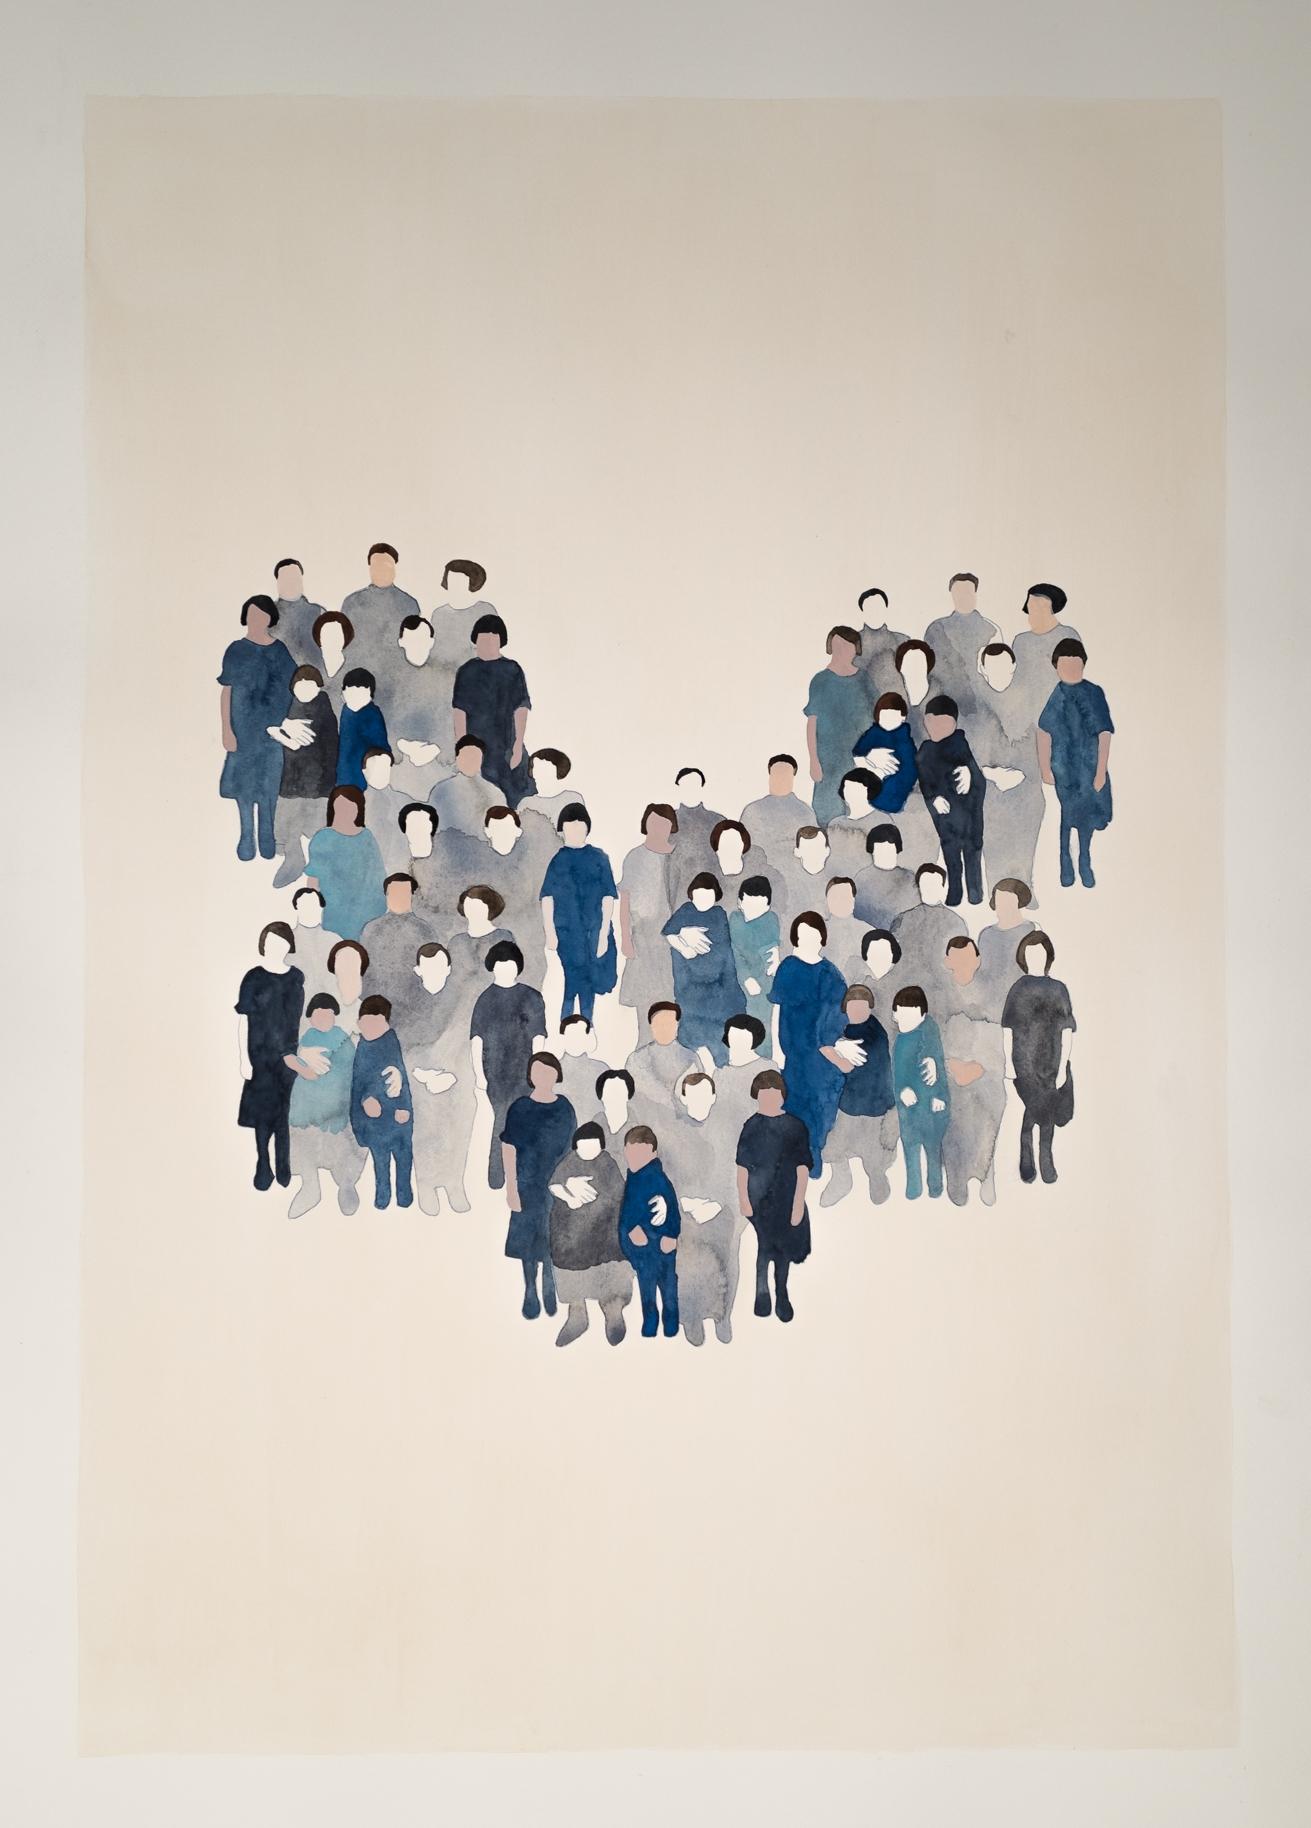 Generation n.1, 2015 Watercolour on paper 70 x 100 cm